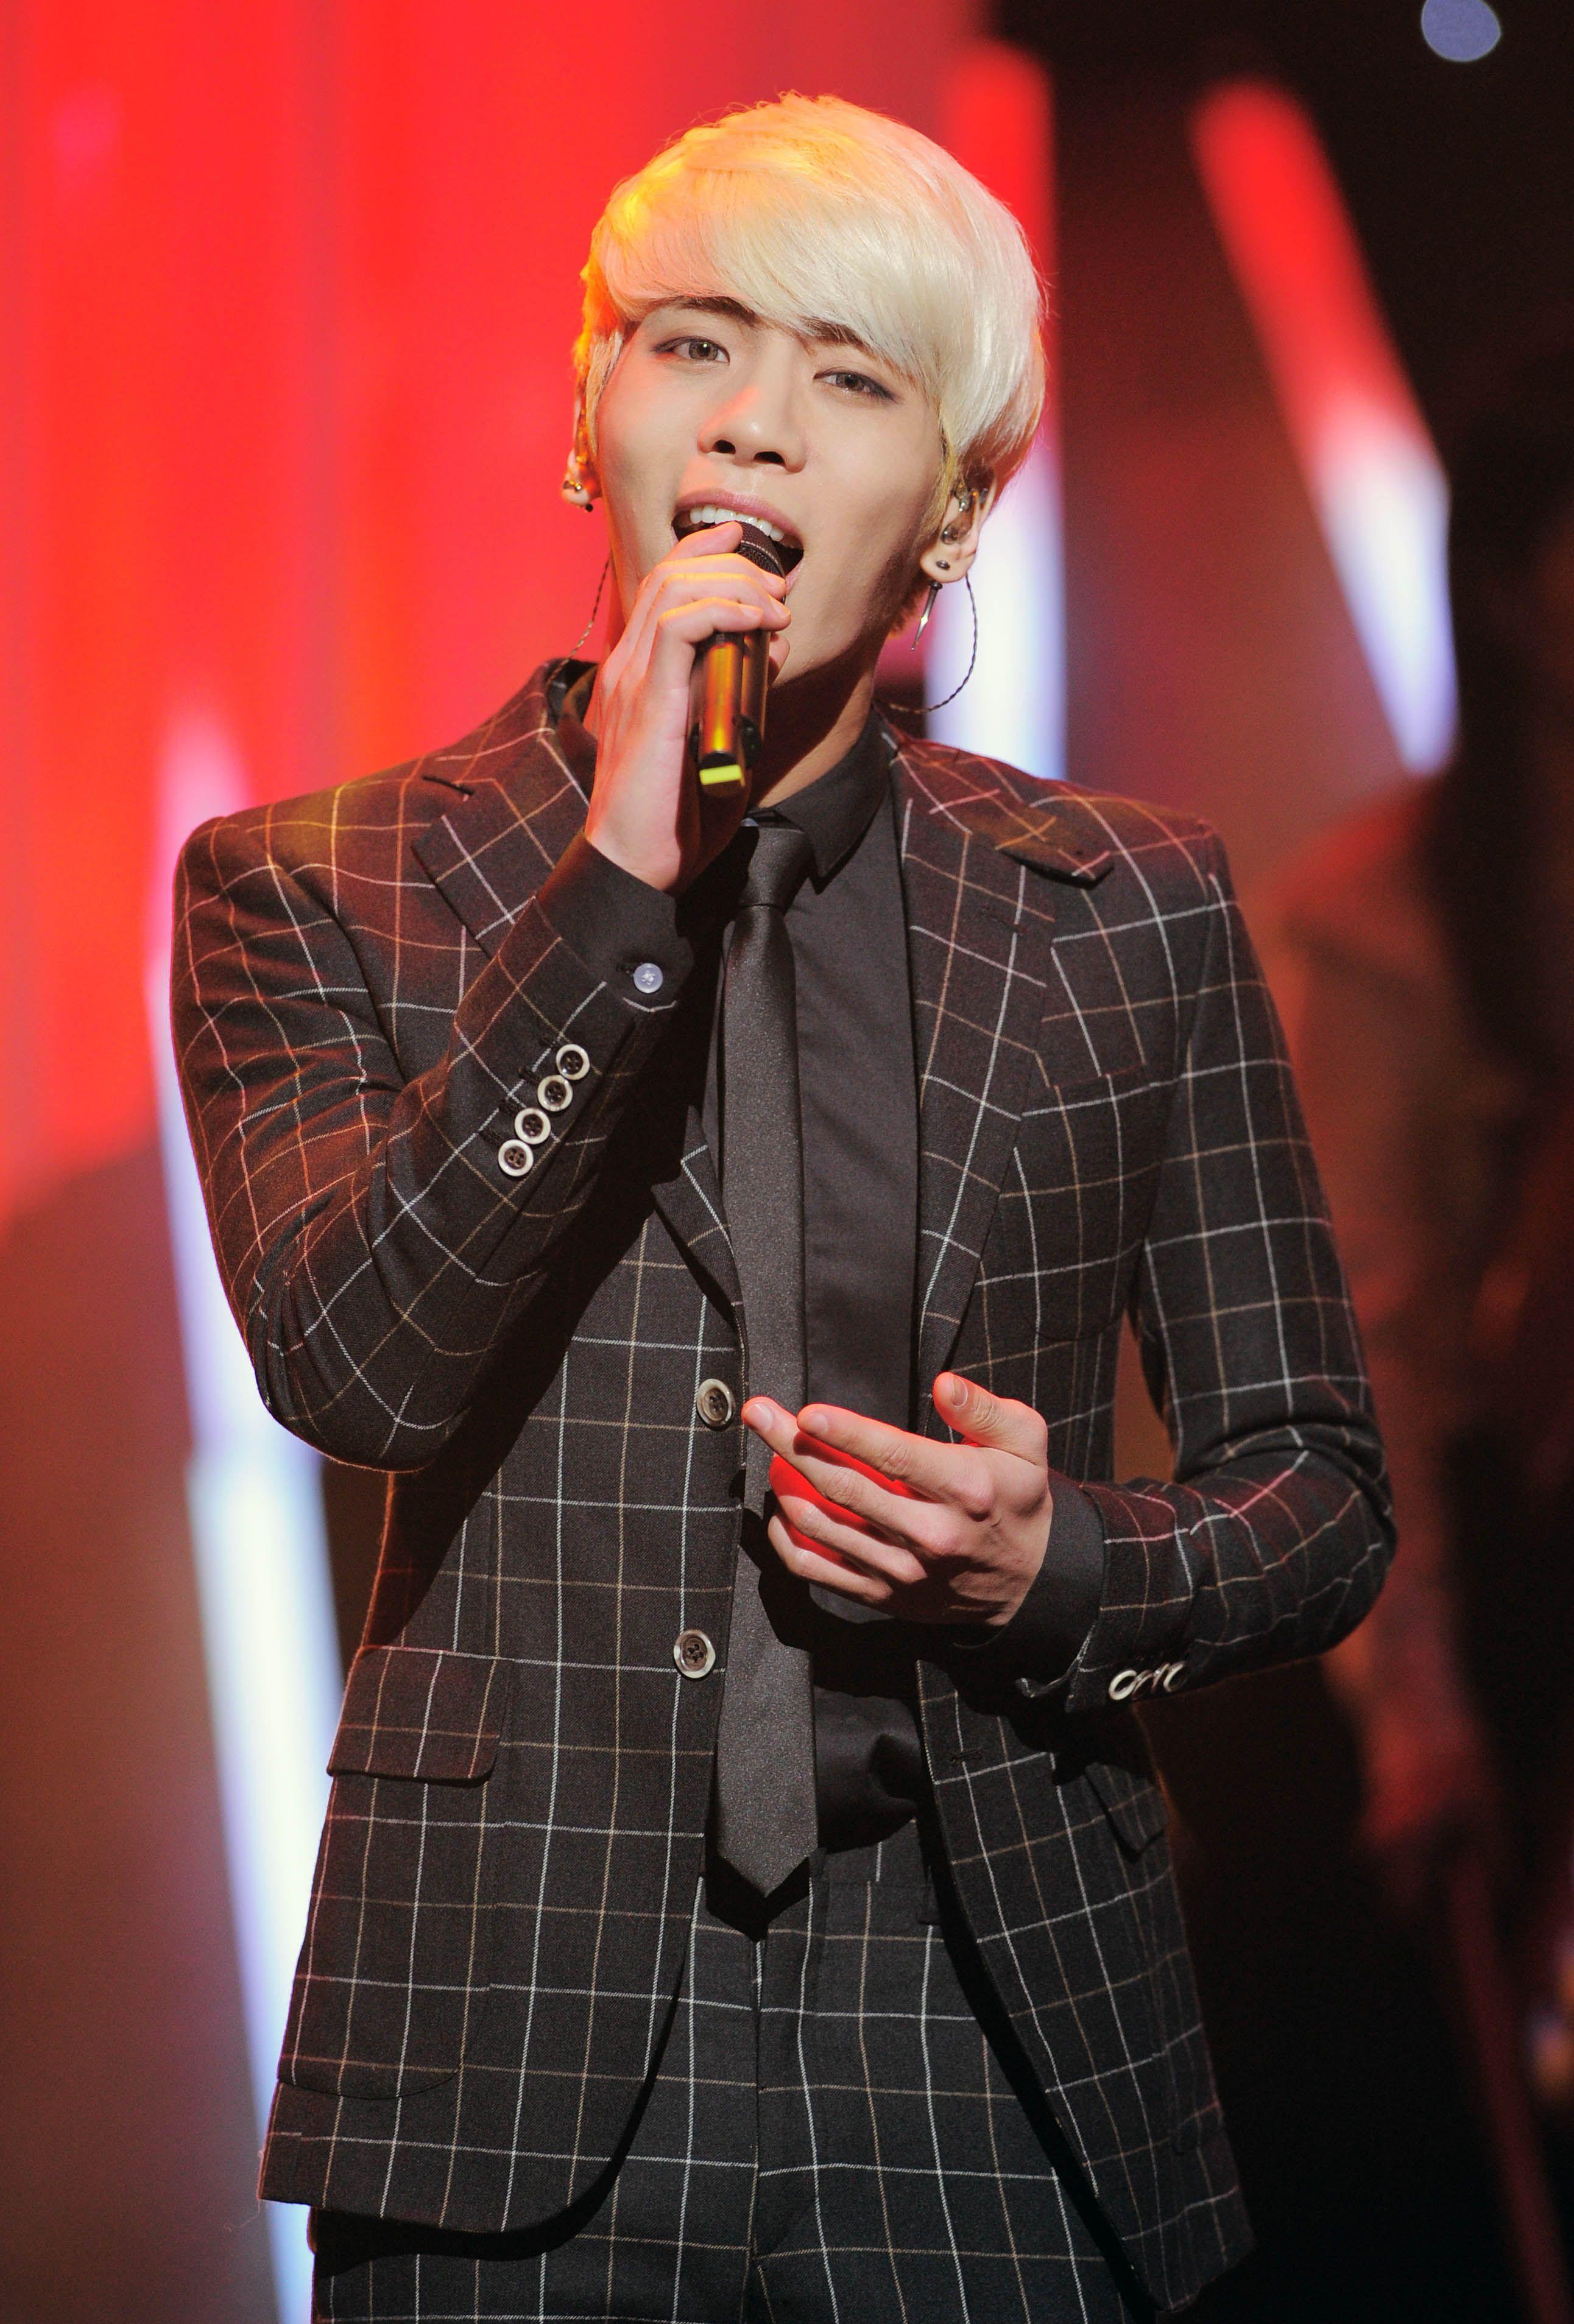 Korean boy band lead singer Kim Jong-hyun died at 27